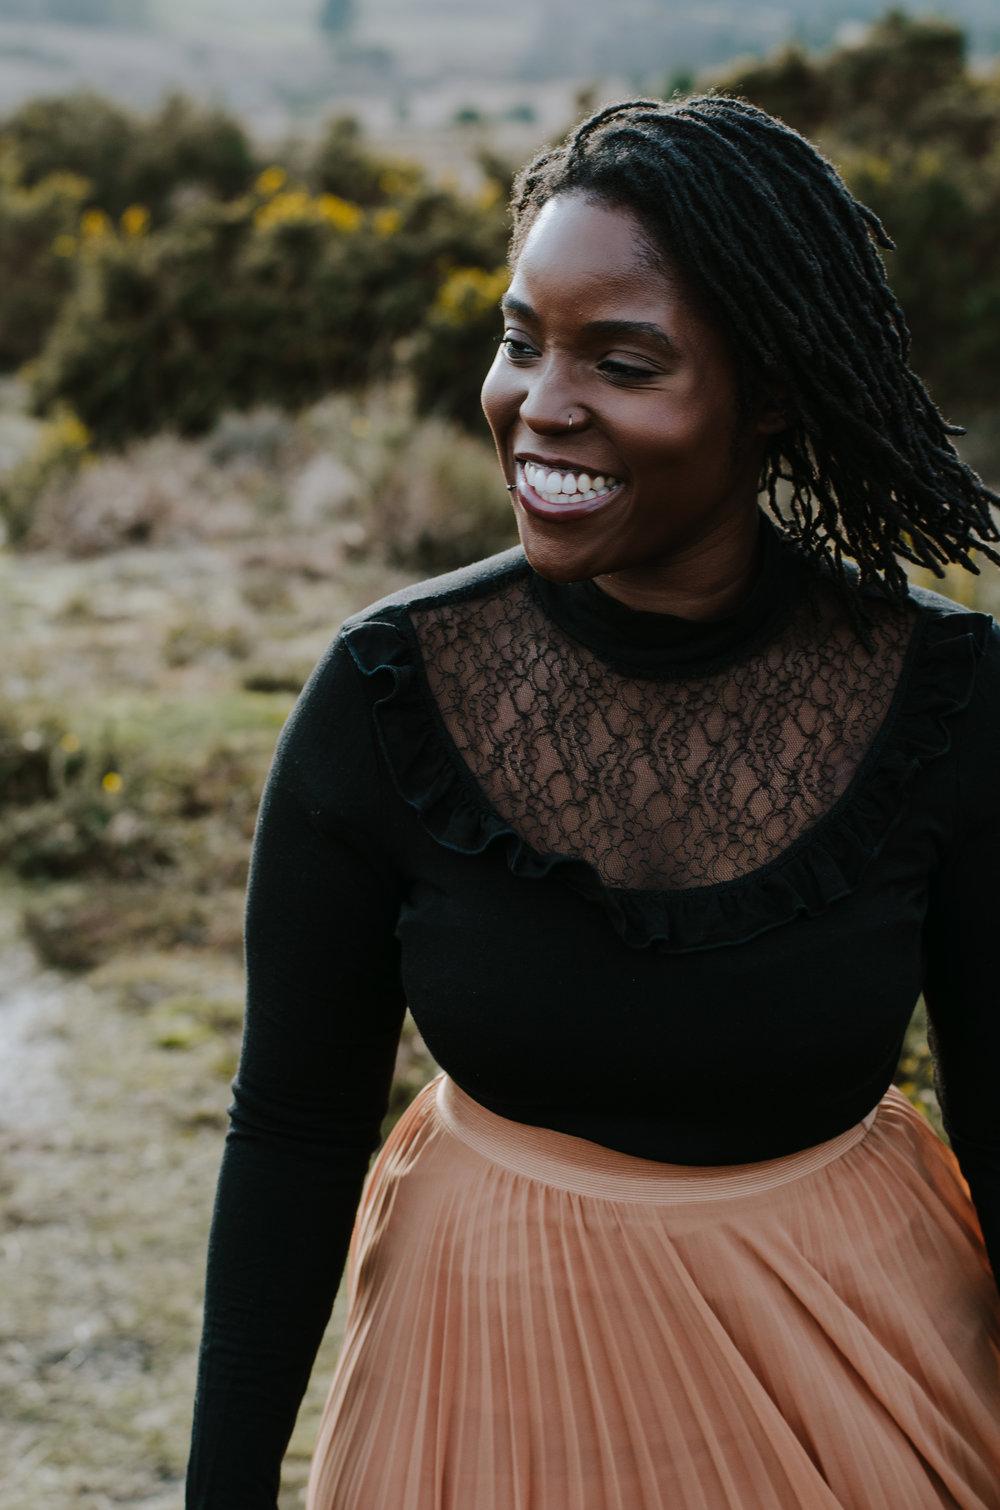 Hilda - Ashdown Forest Portraits - Aiste Saulyte Photography-20.jpg